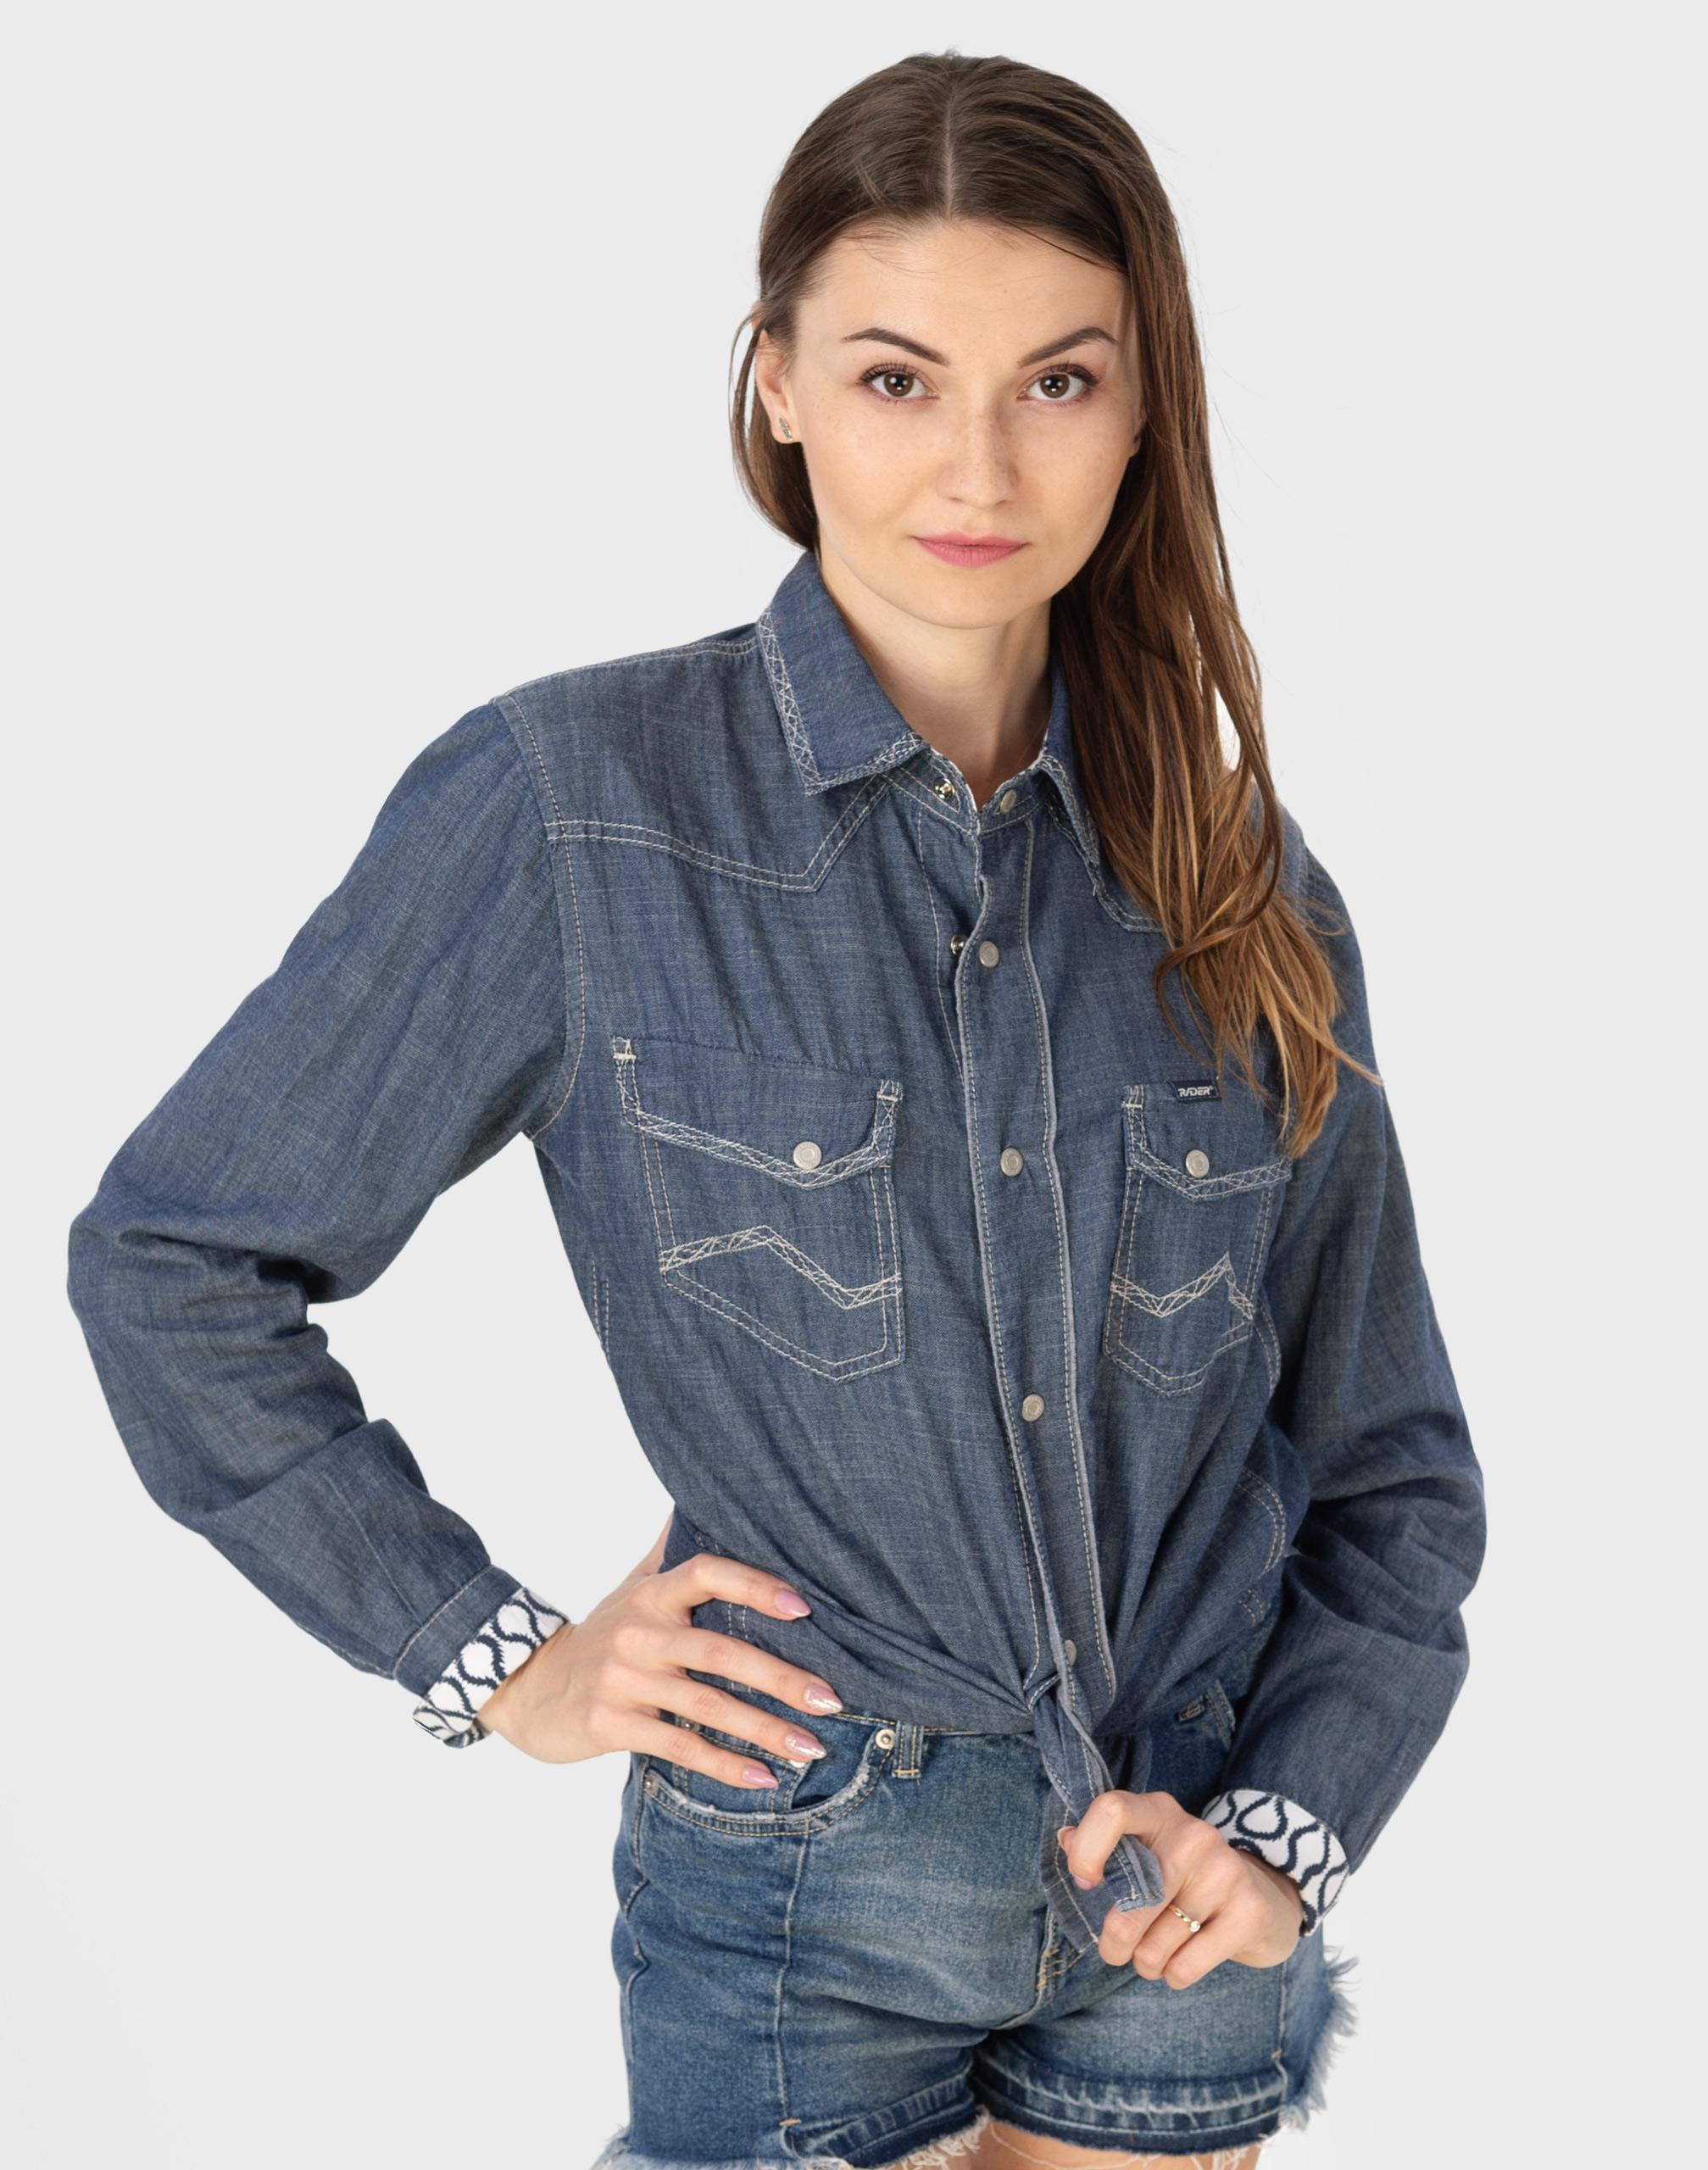 Koszula Damska Jeansowa Bluzka Denim Jeans 917 XL 7523894593  oDIF9